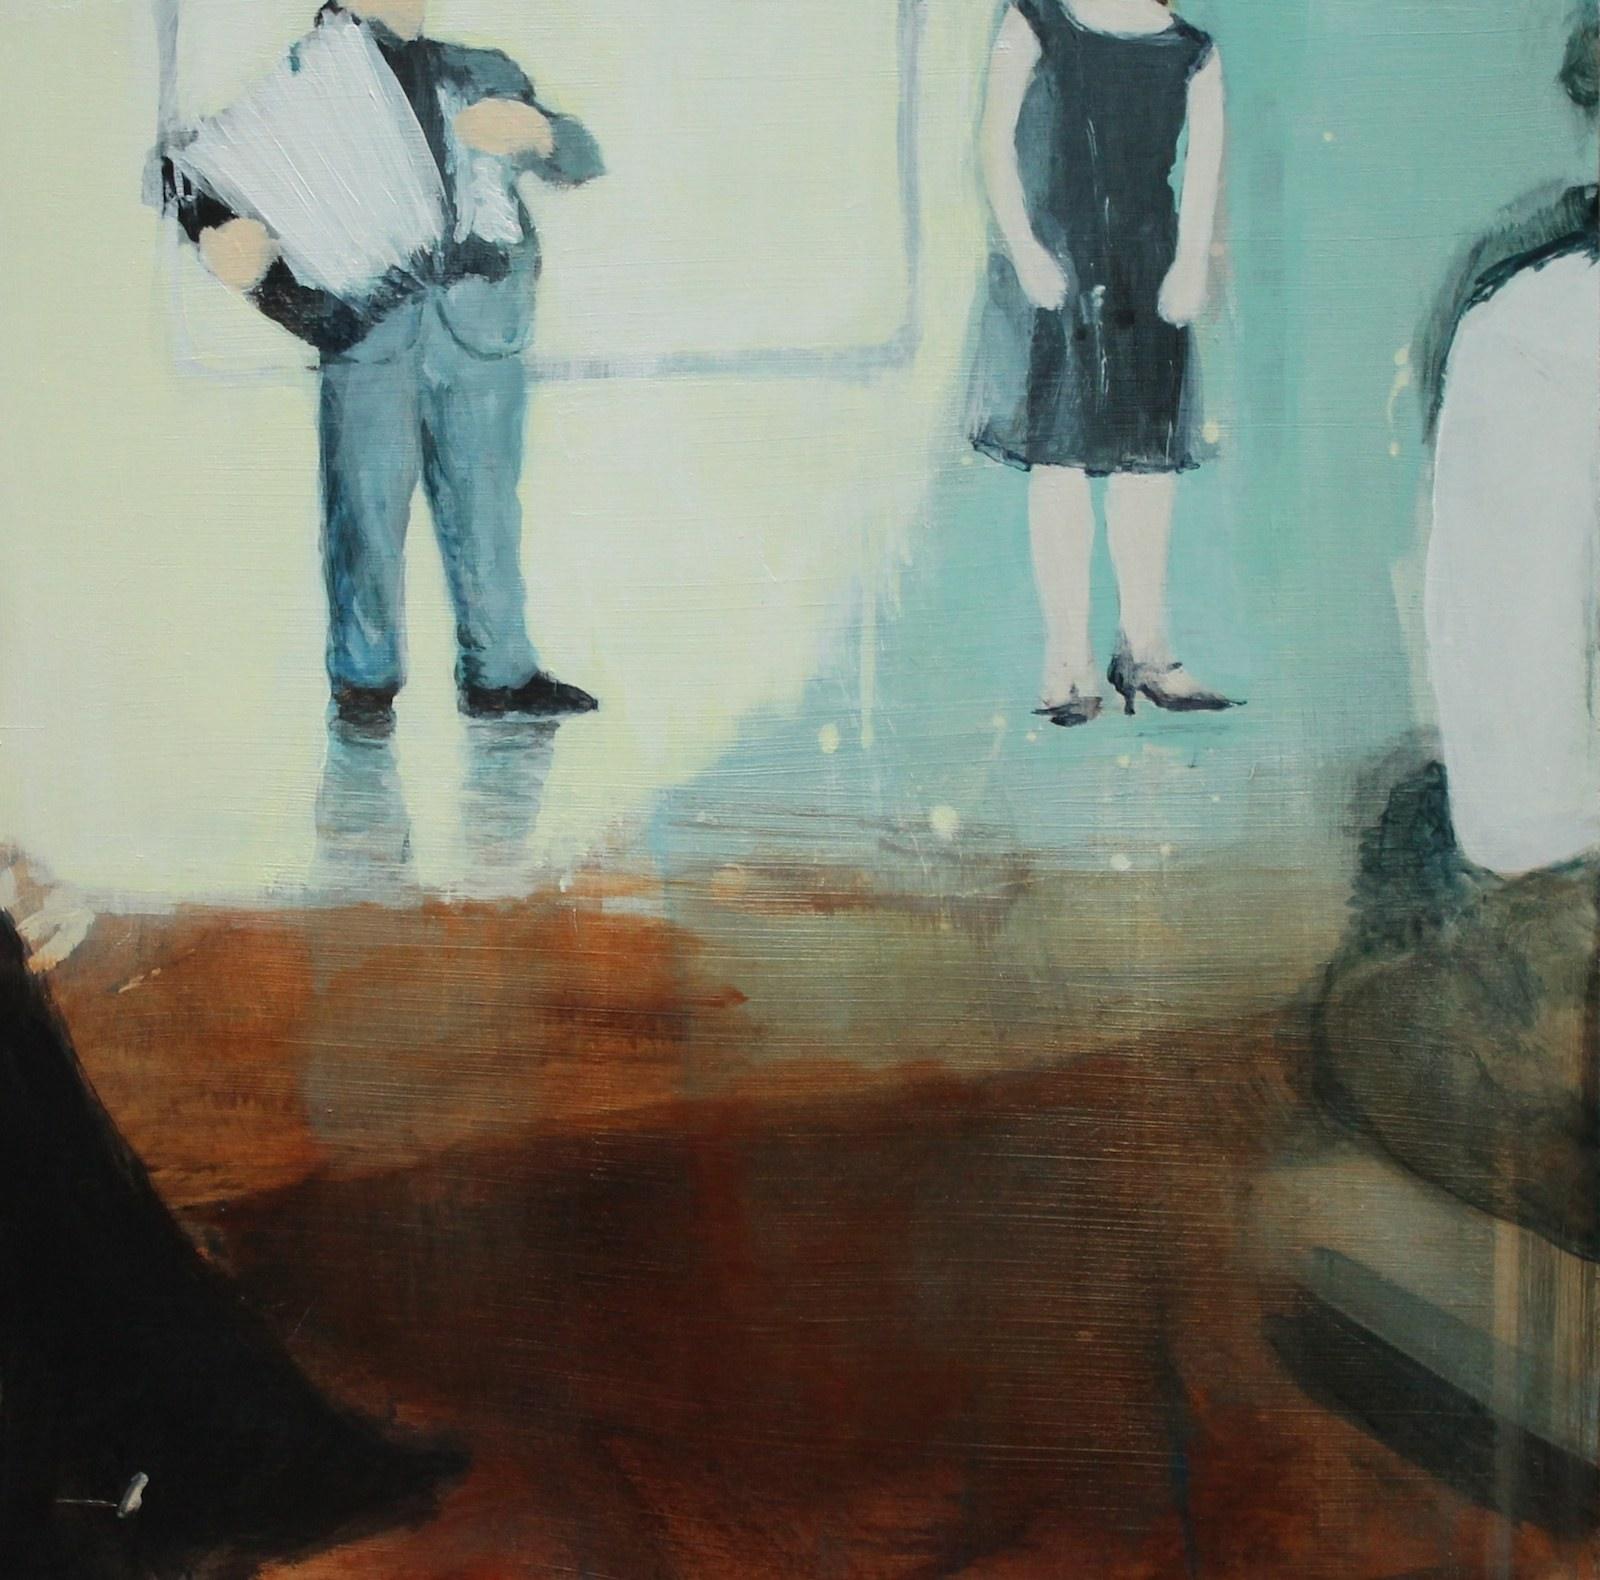 Duet 40 cm x 40 cm, acrylic on mdf, 2019